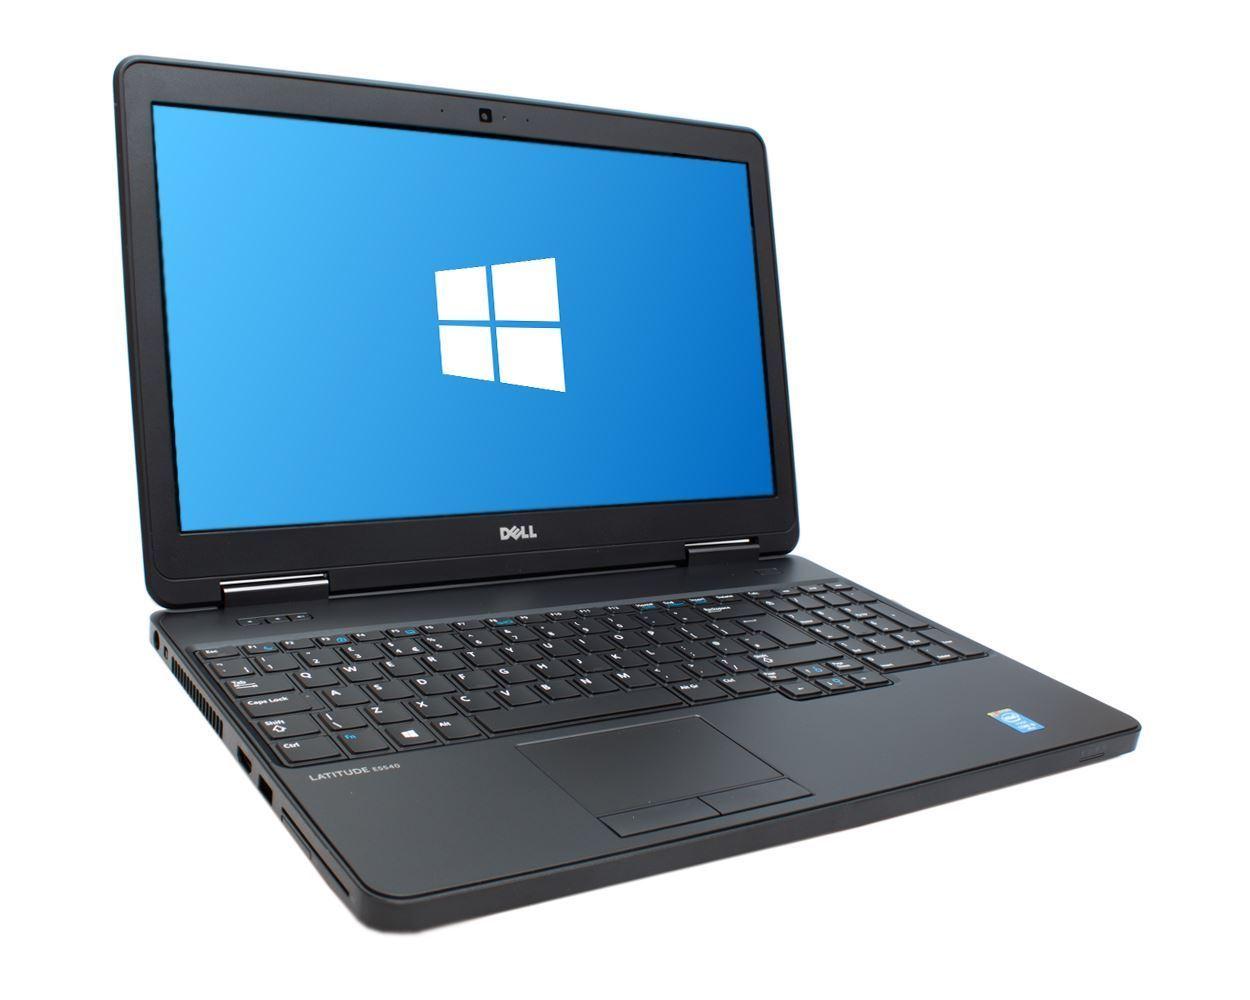 Dell Coporate Model Core I5 Laptop 8gb Ram 240gb Ssd